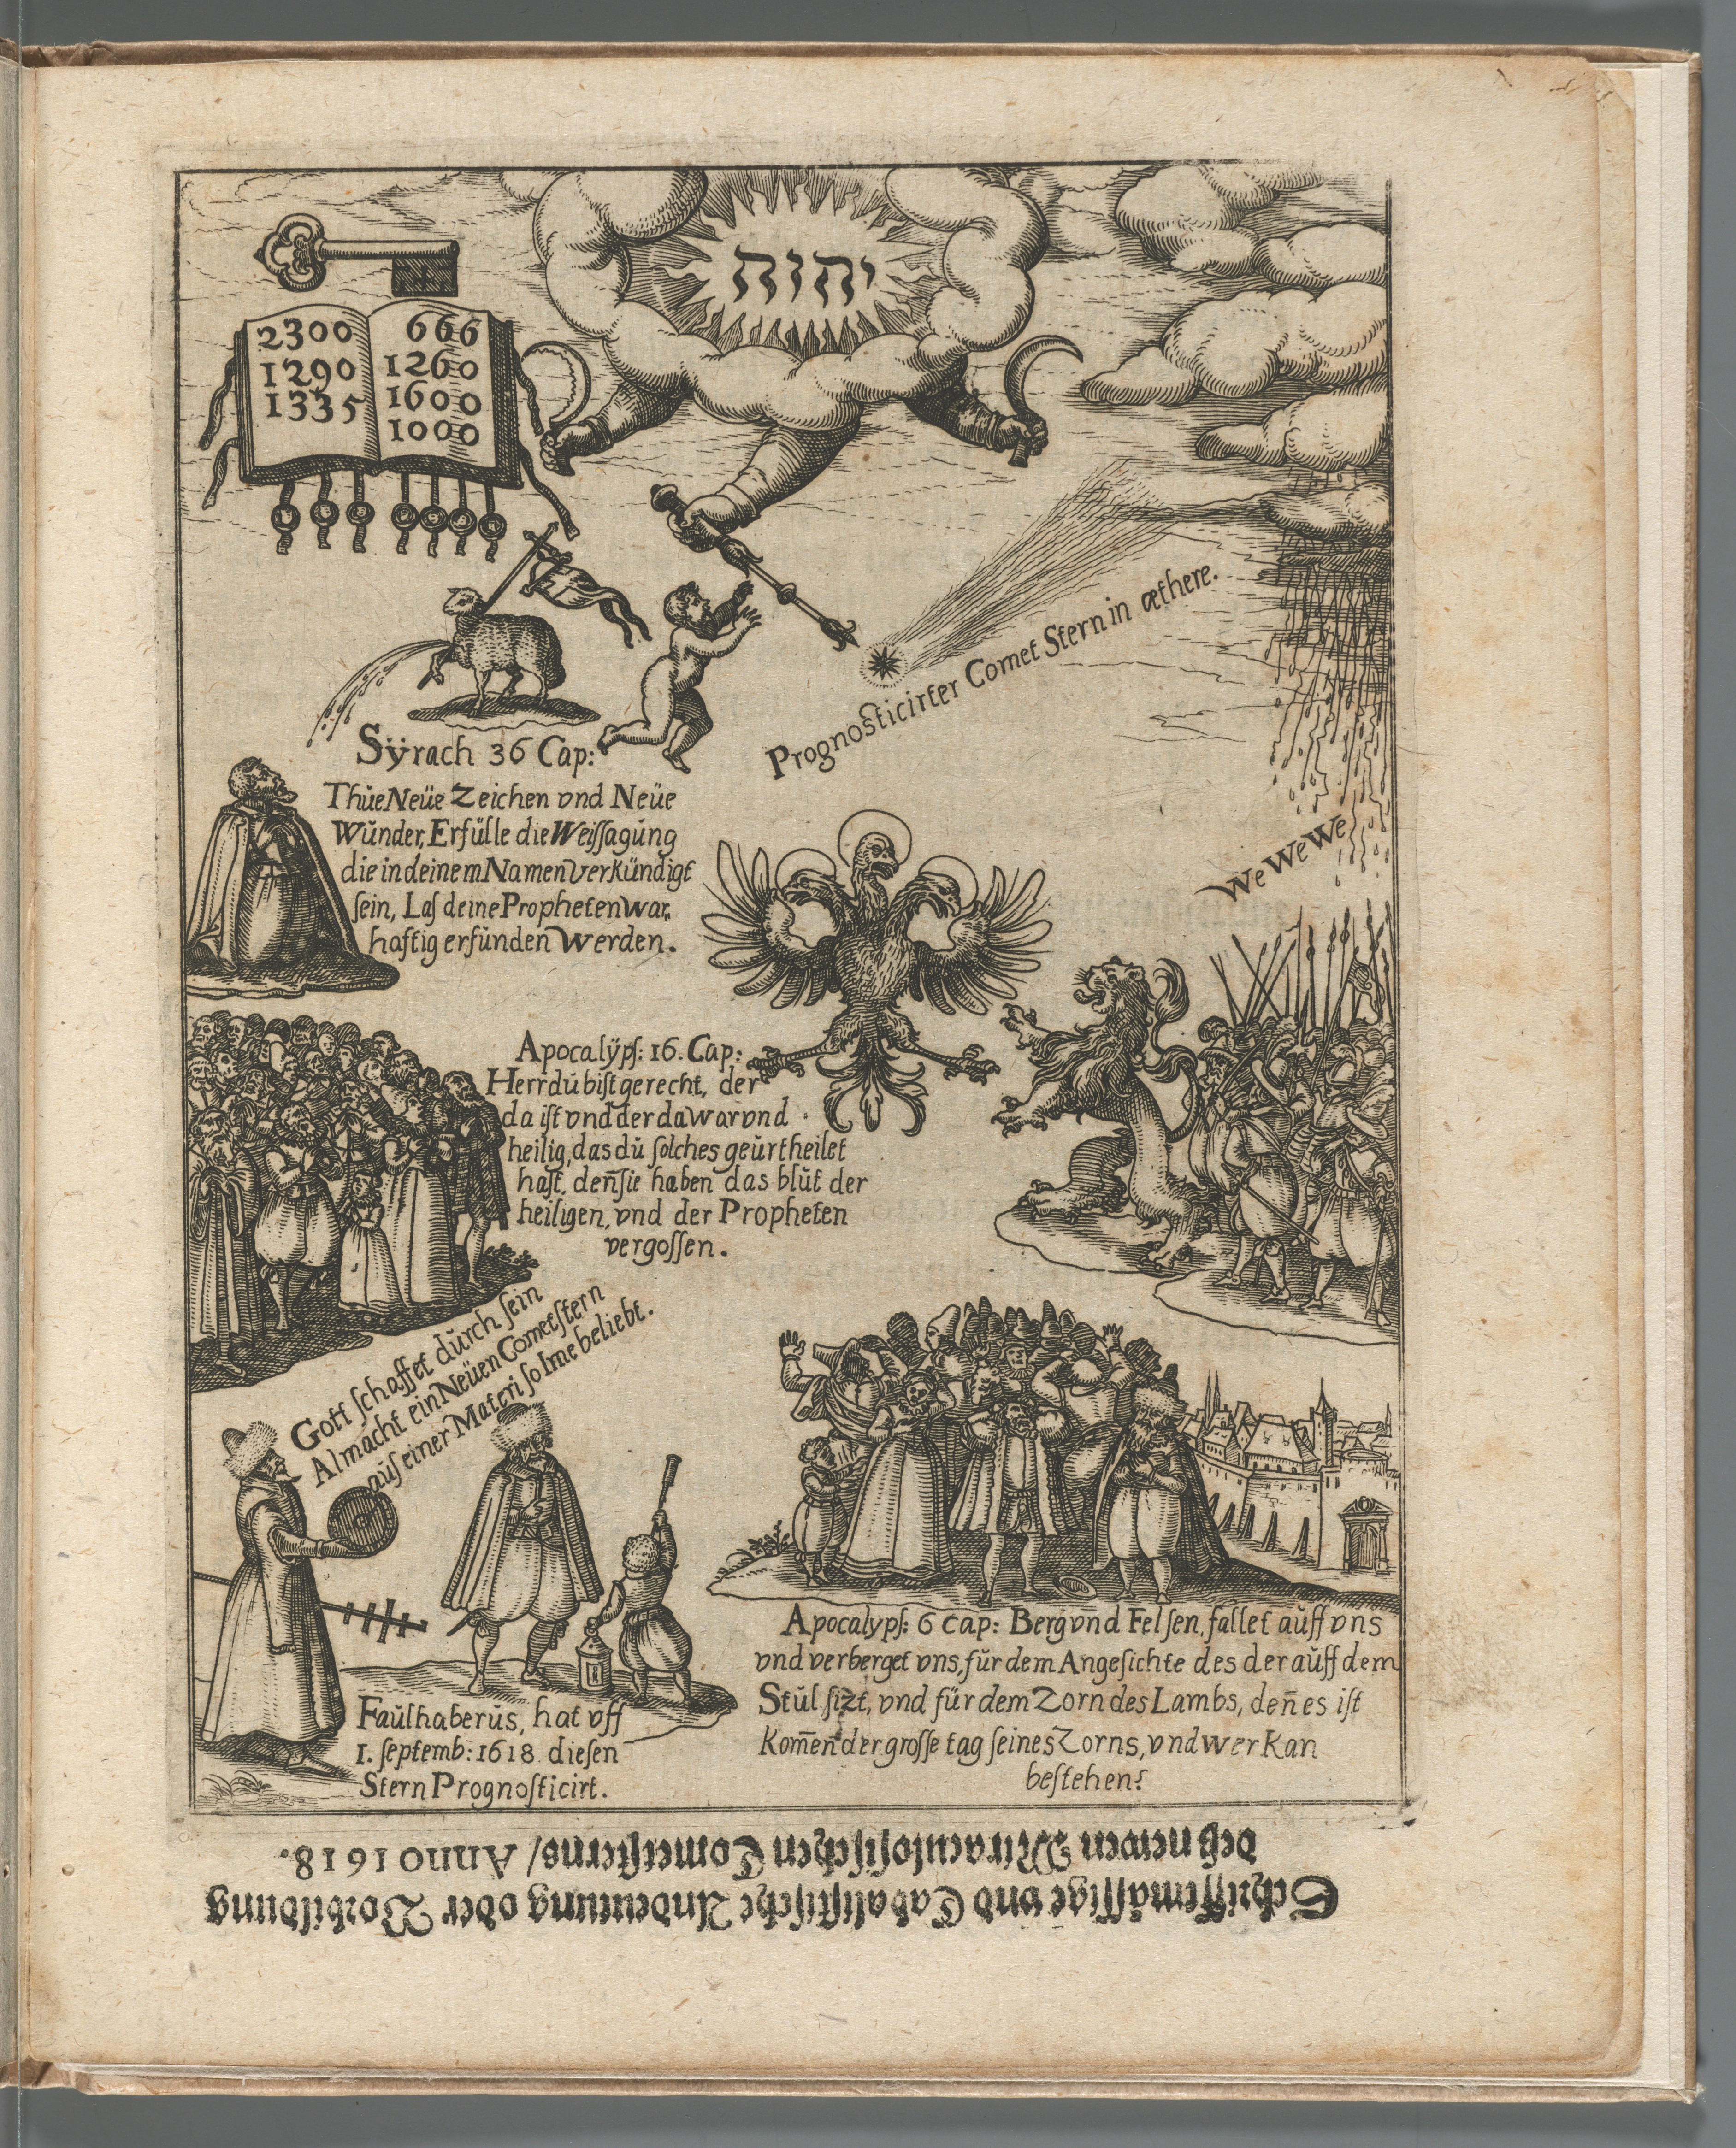 Faulhaber, Johannes, 1580-1635. Fama syderea nova, 1618. *GC6.F2735.618f